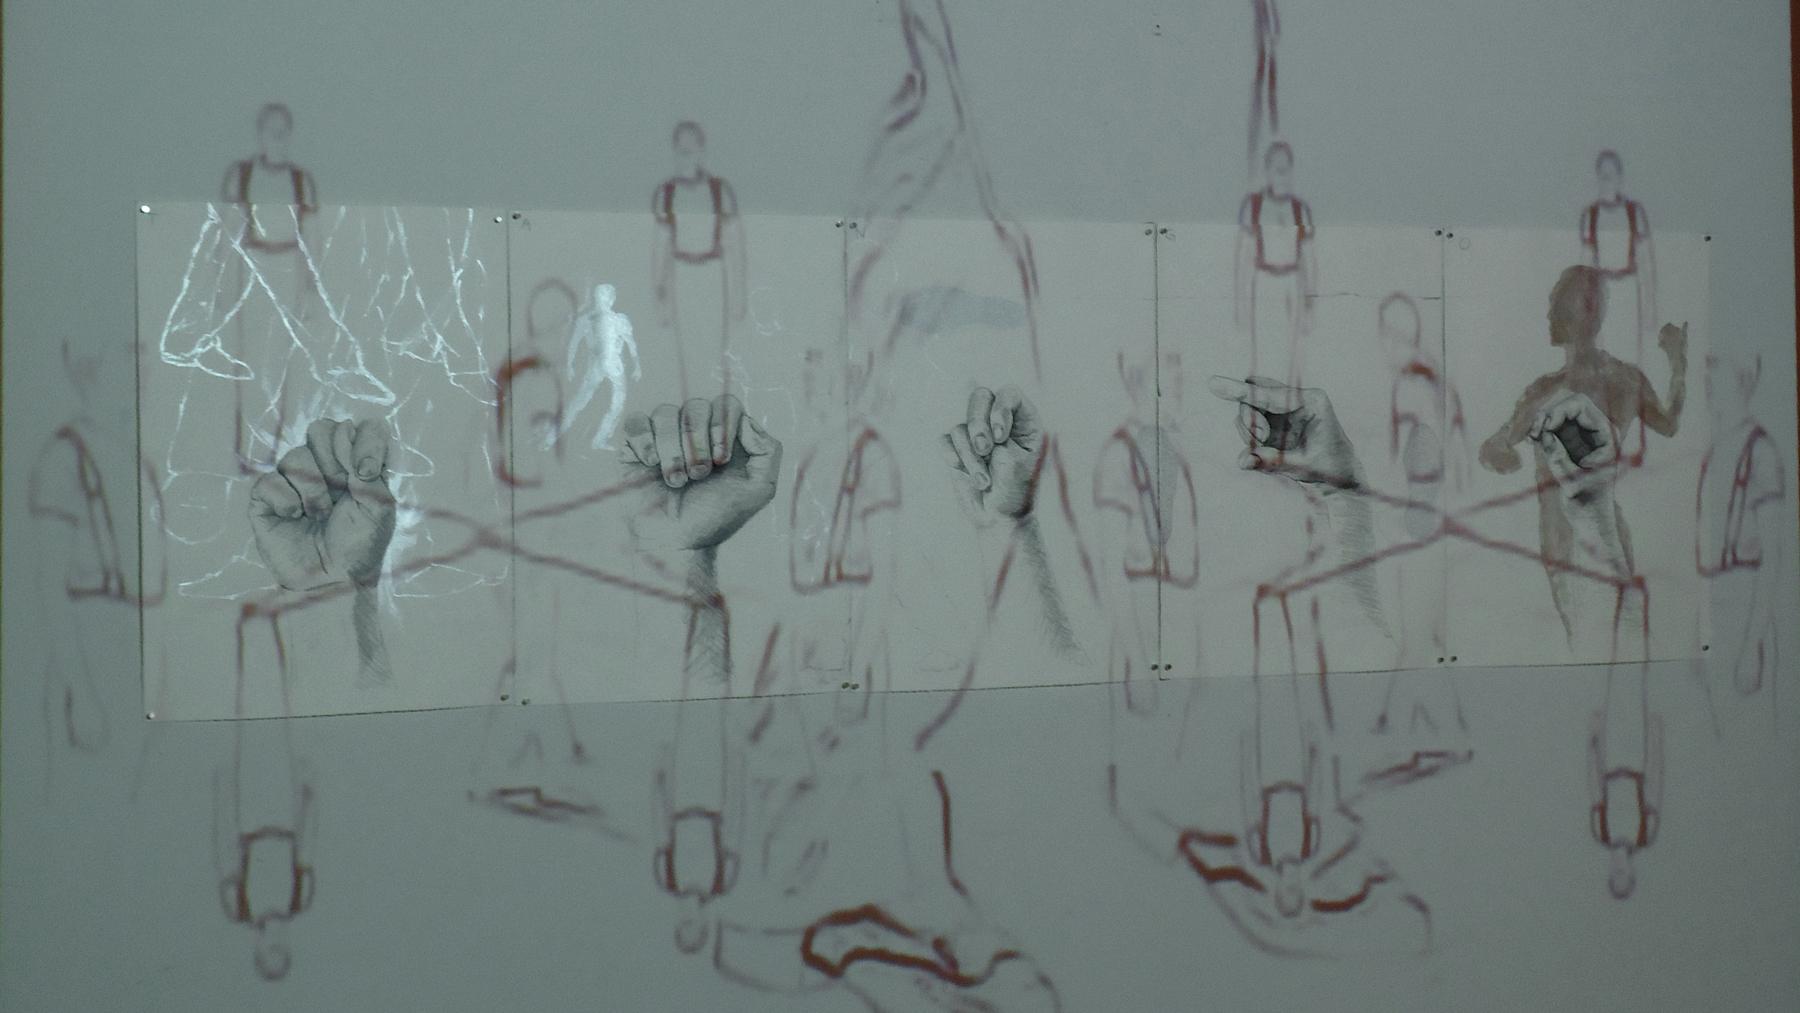 TANGO (2011)   Installation documentation at the N'Namdi Center for Contemporary Art, Detroit, MI.